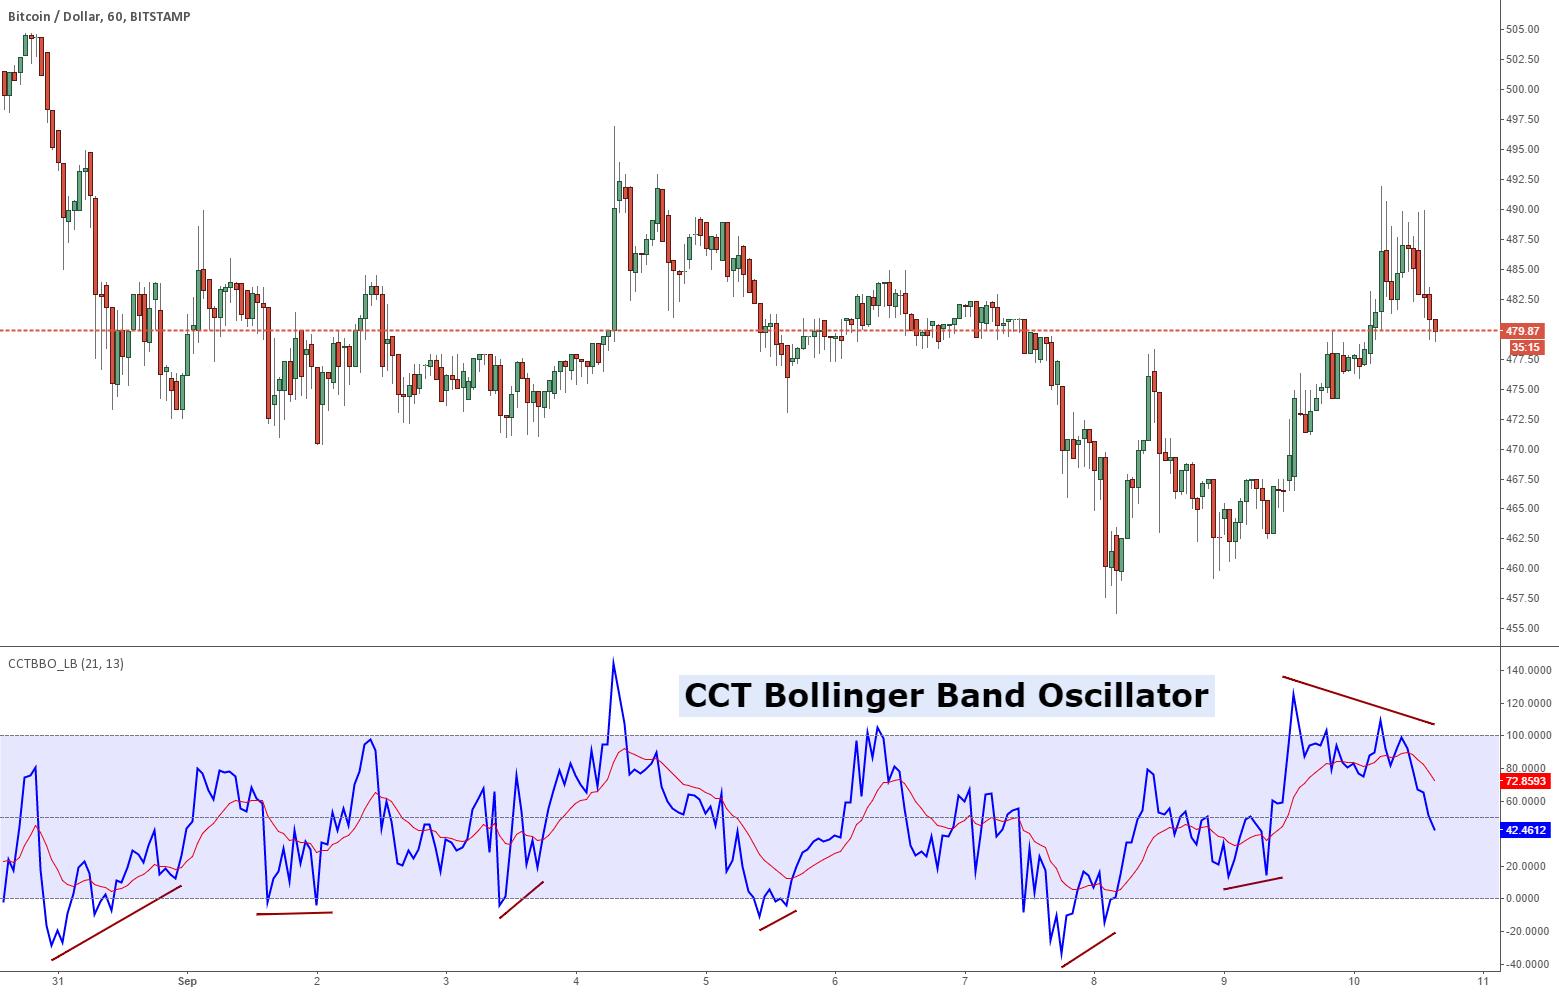 CCT Bollinger Band Oscillator